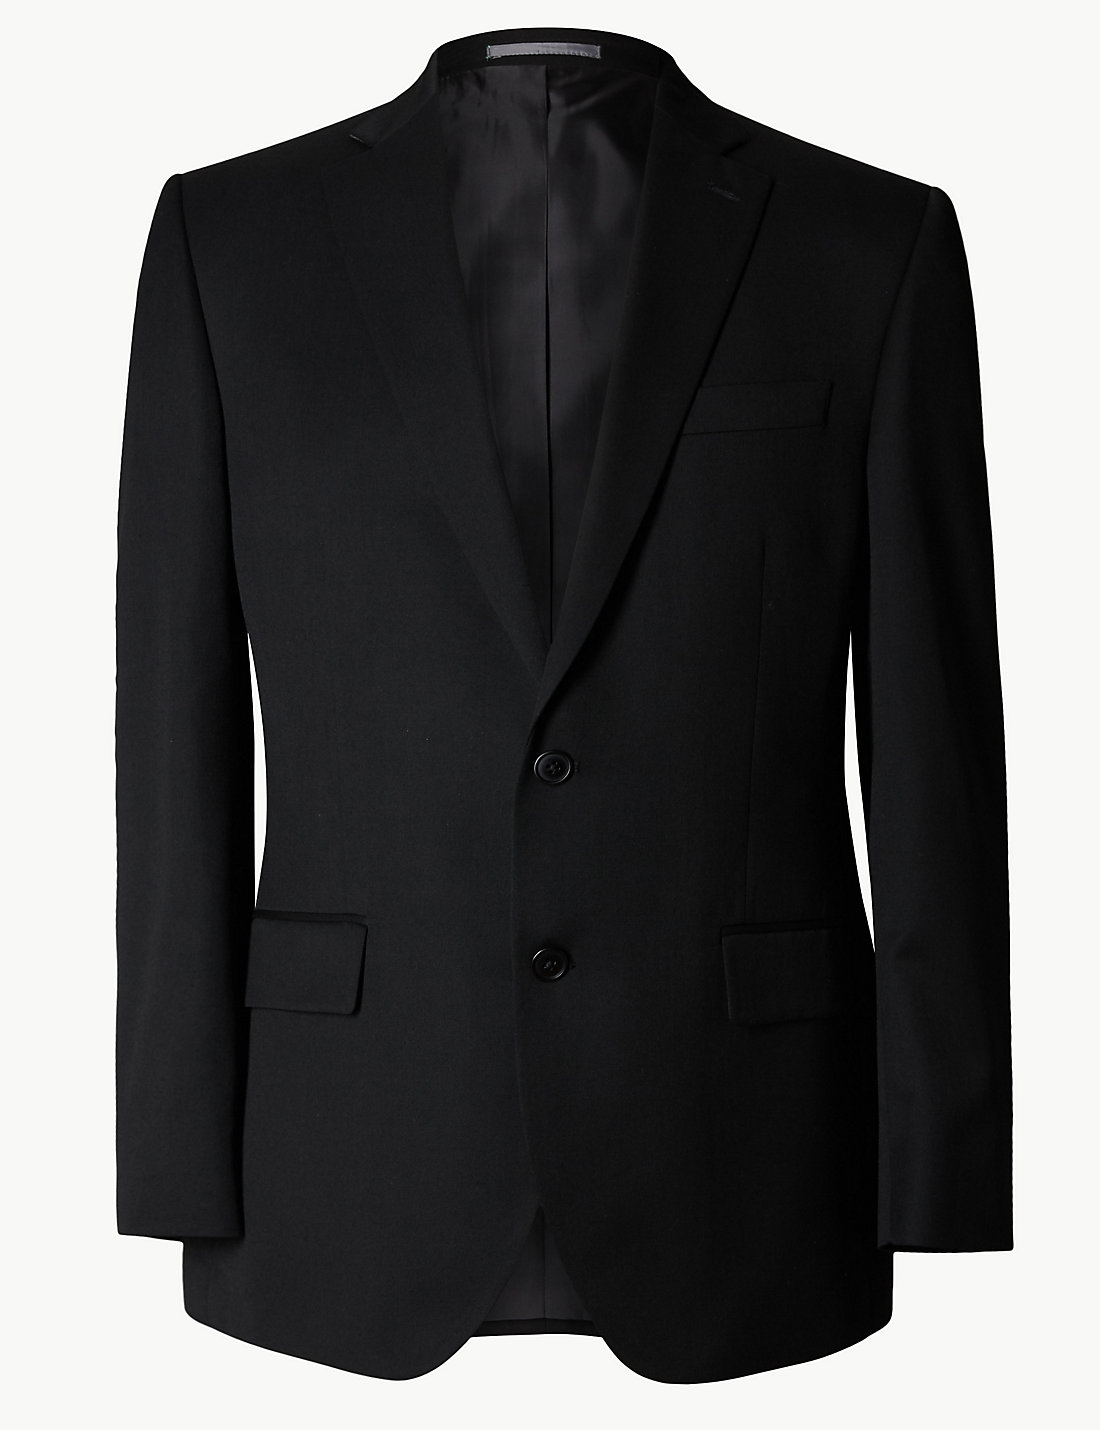 Black slim fit suit ms black slim fit suit izmirmasajfo Images